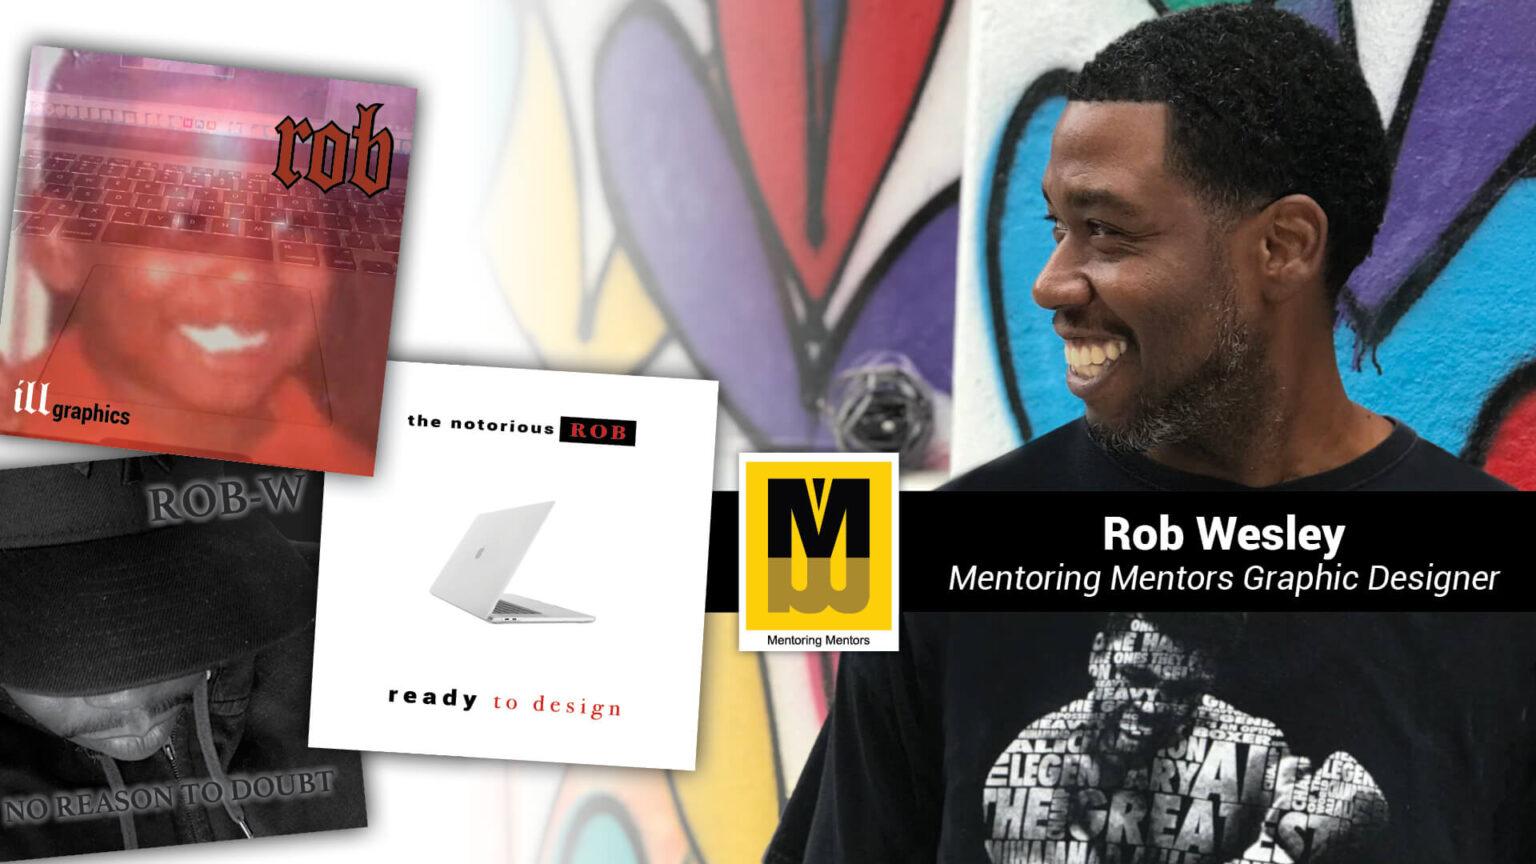 Mentoring Mentors Graphic Designer